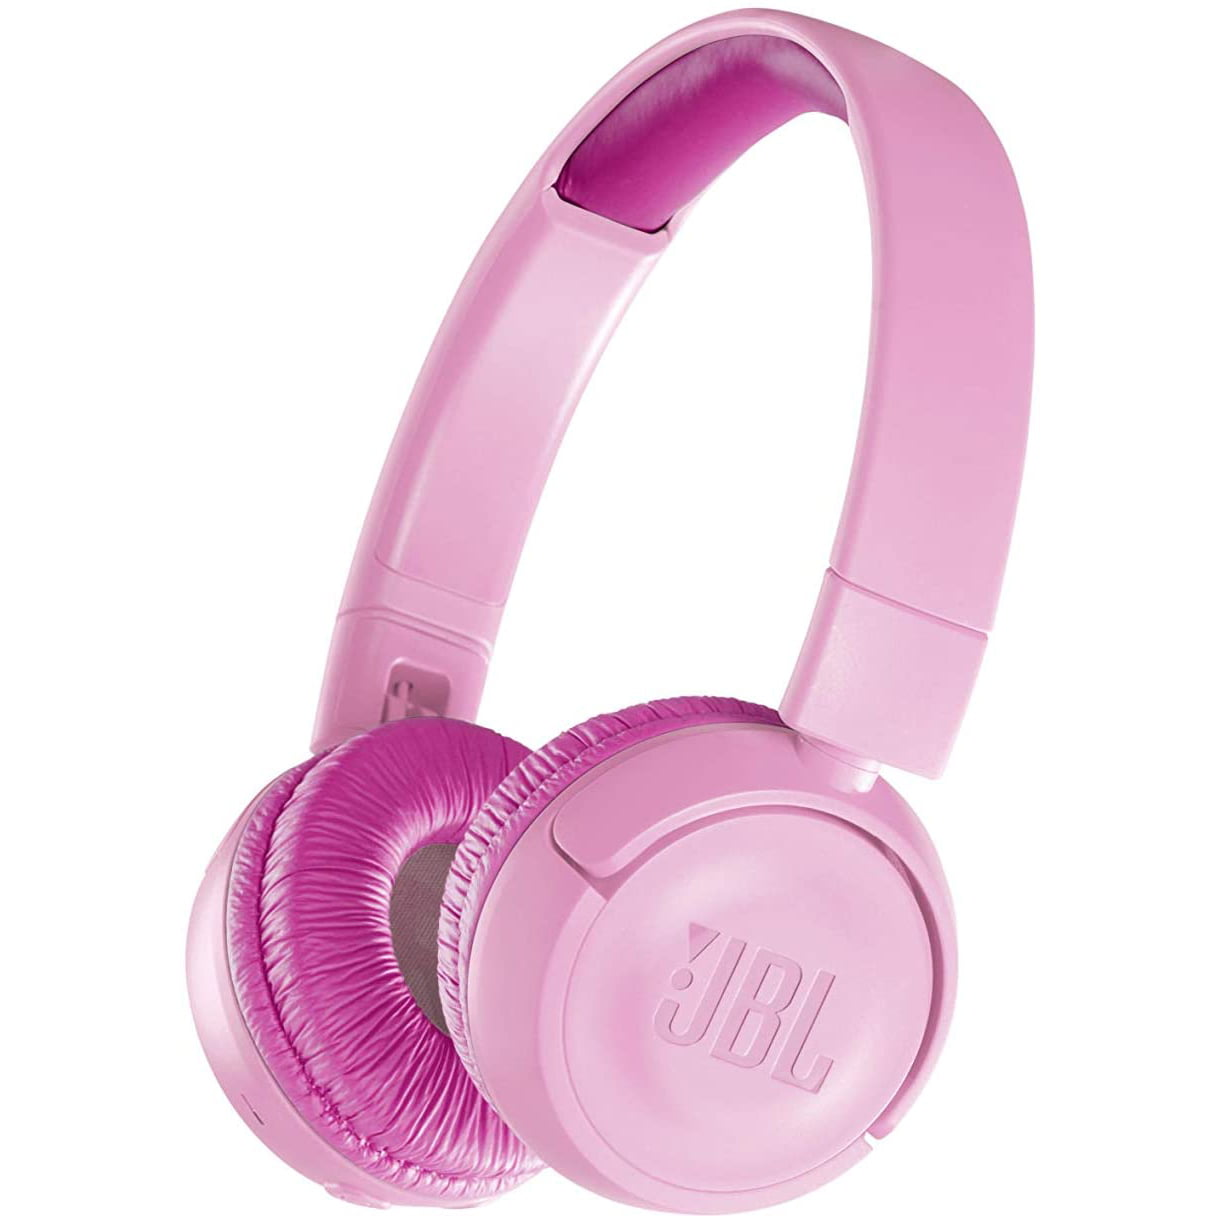 Casti audio On-Ear JBL JR300, Safe Sound, Bluetooth, Light Pink